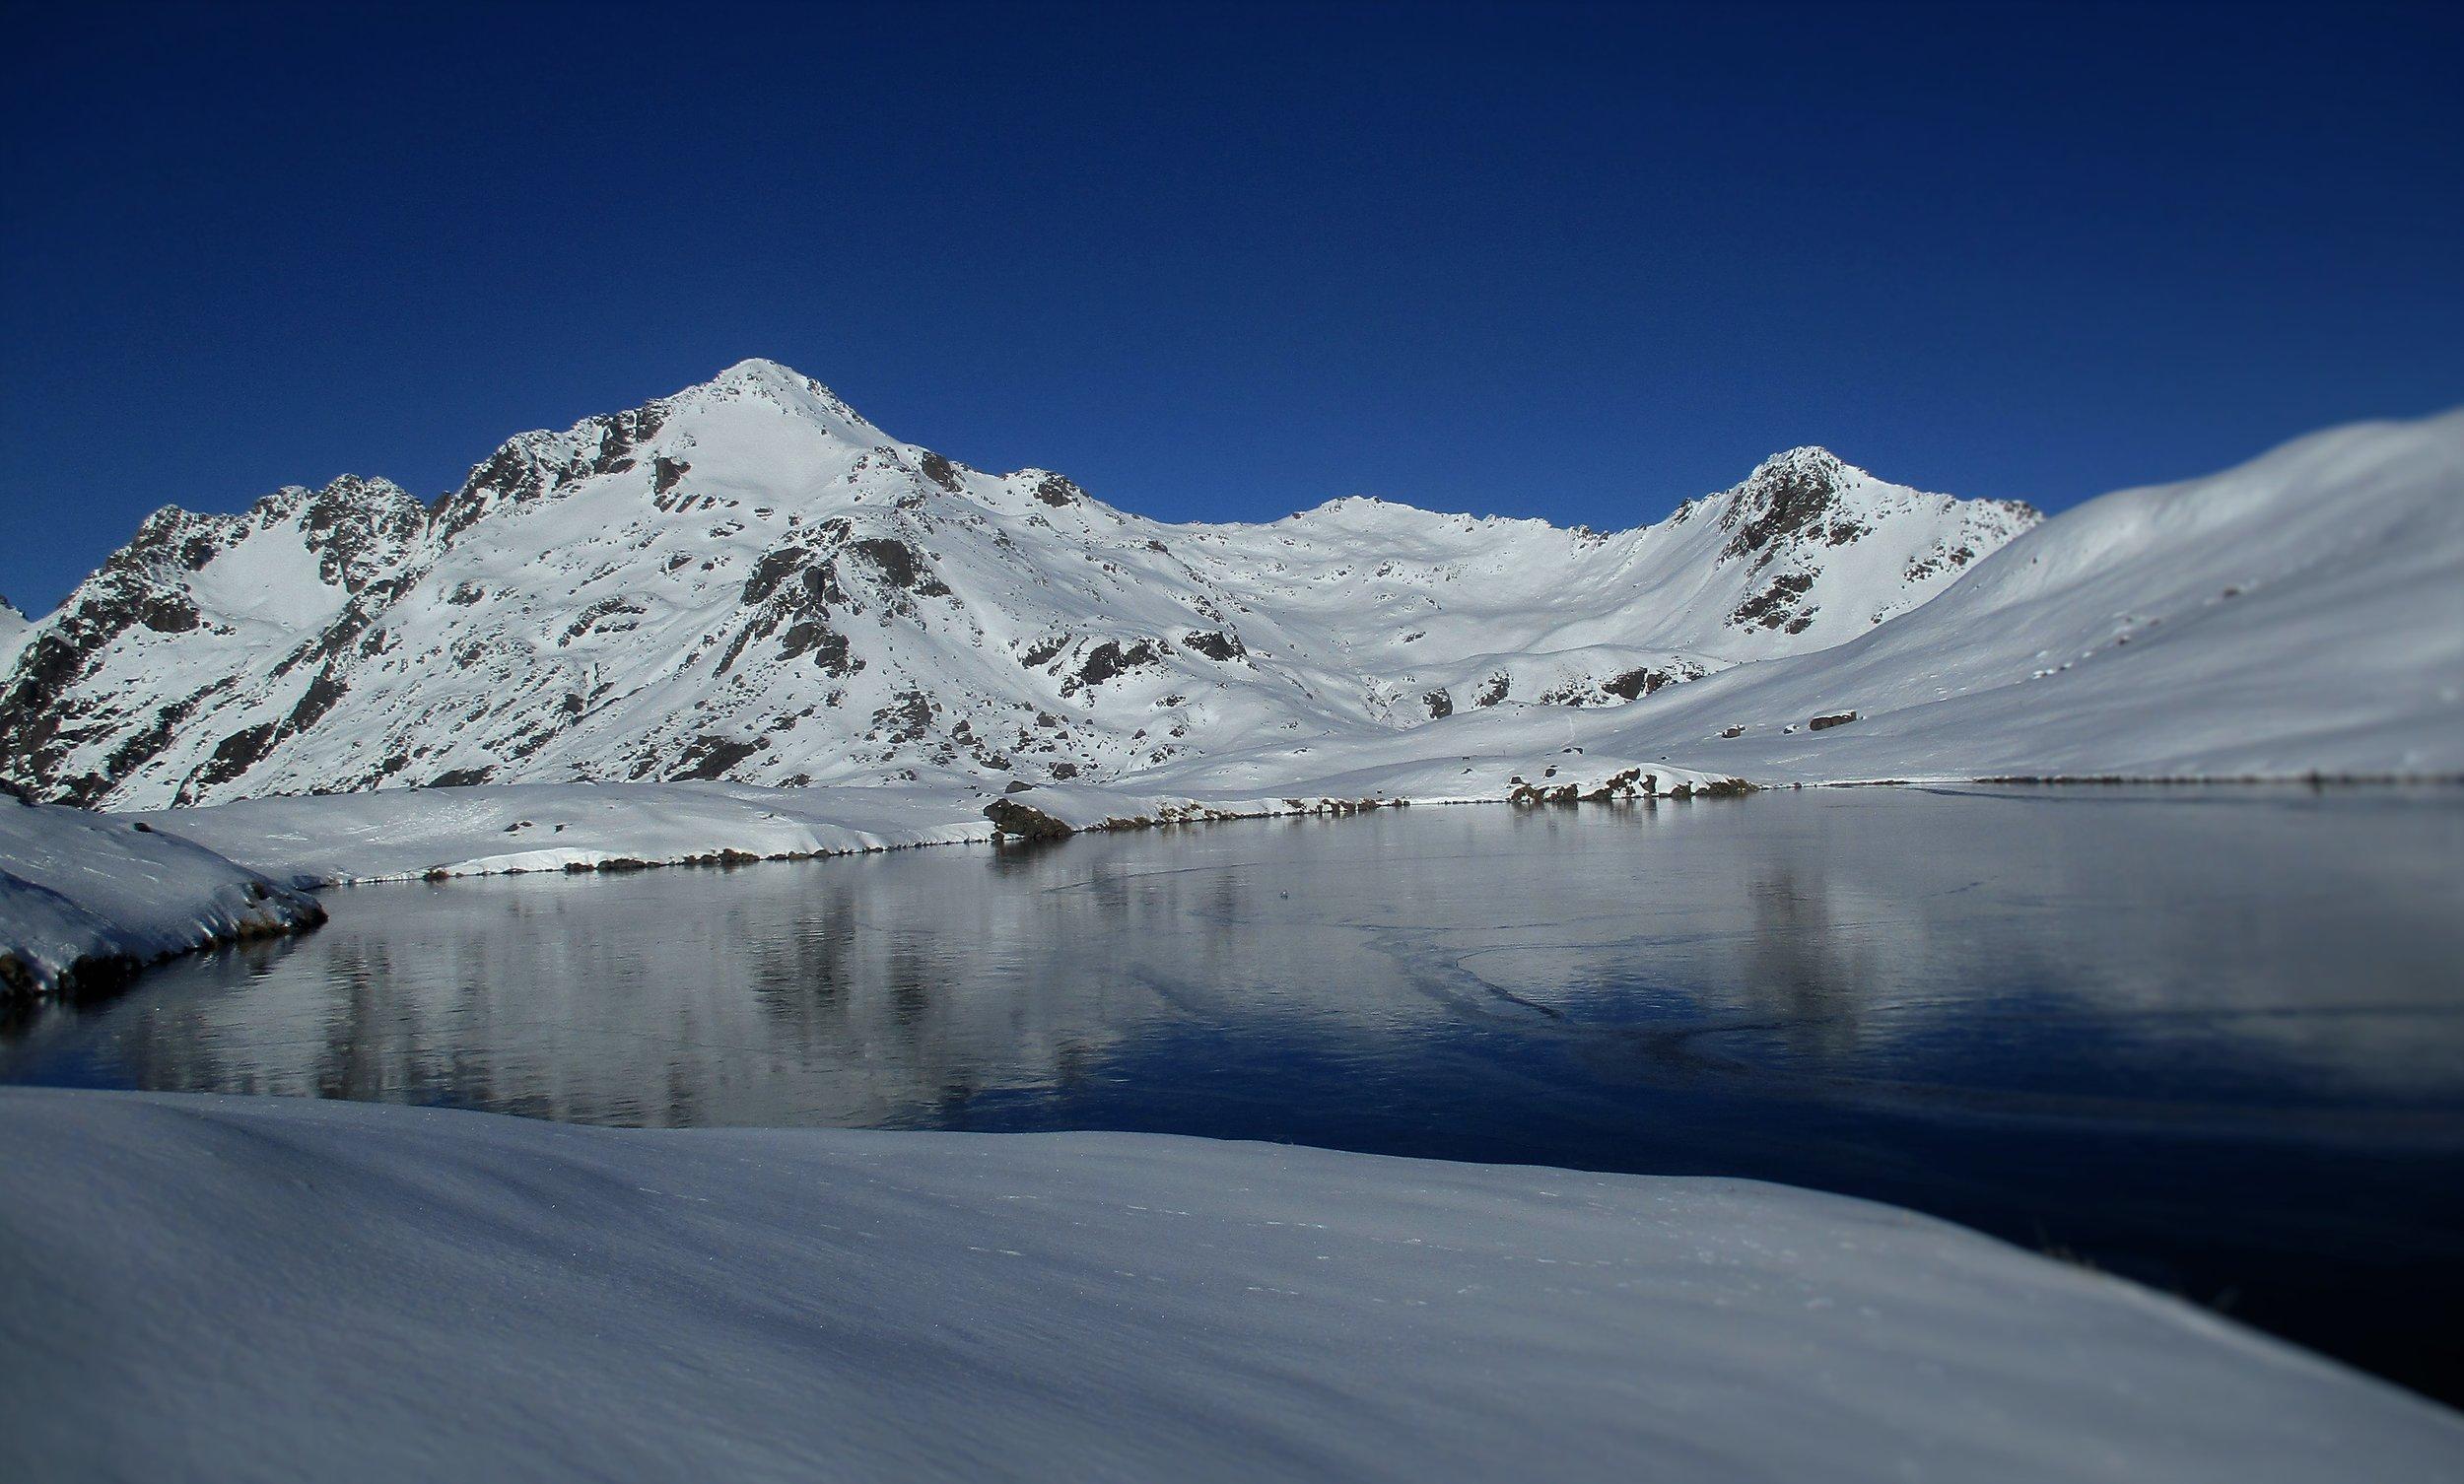 Mount Angelus in early winter.